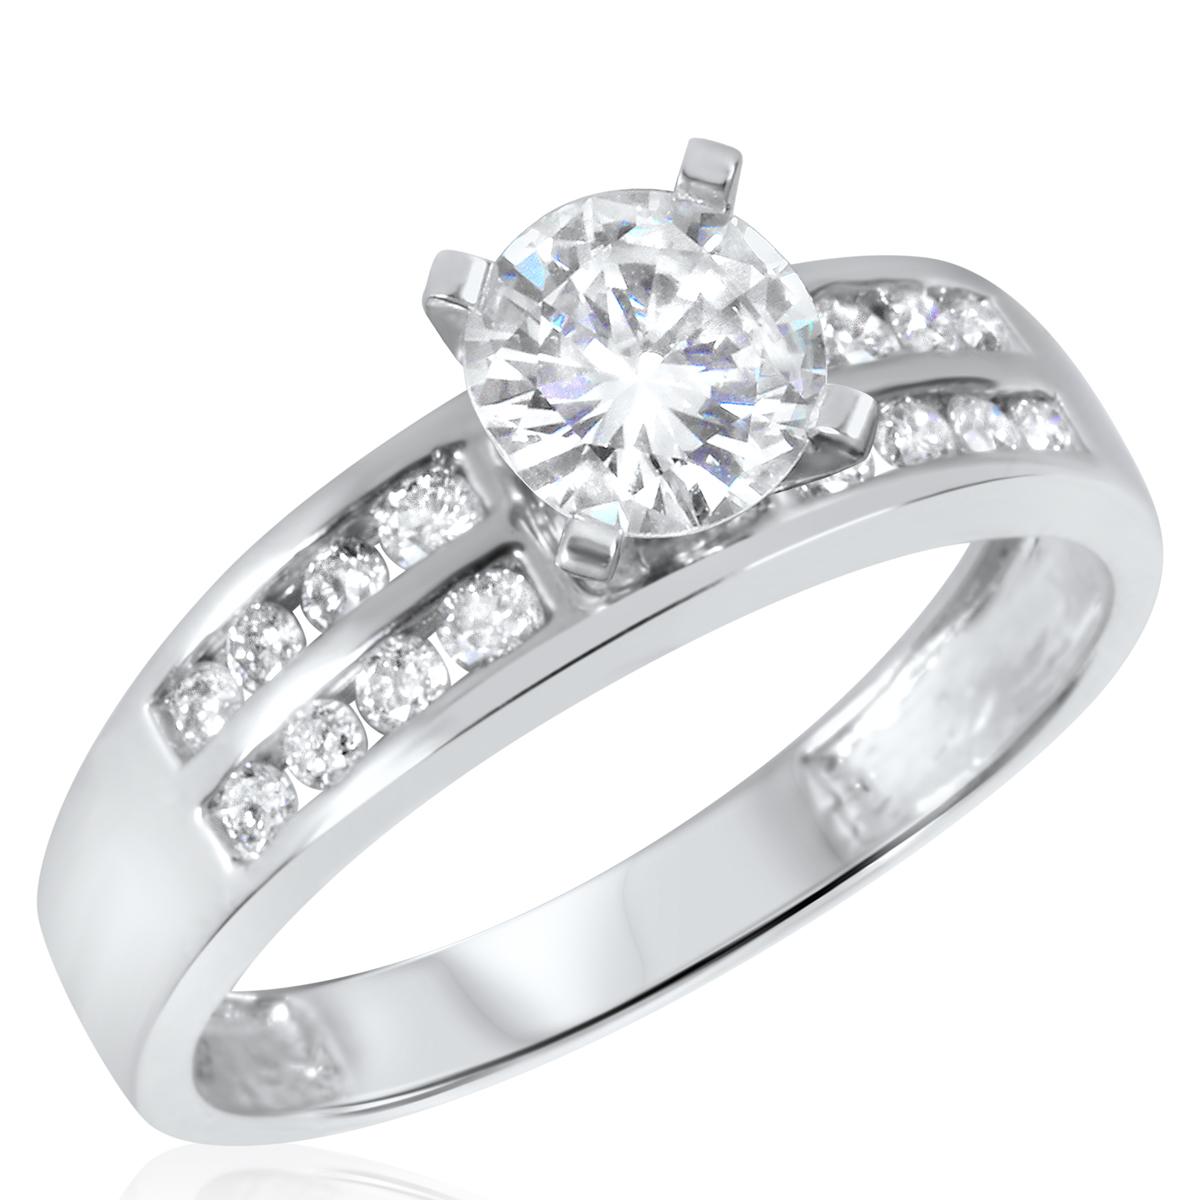 1 1/10 CT. T.W. Diamond Ladies Engagement Ring 14K White Gold- Size 8